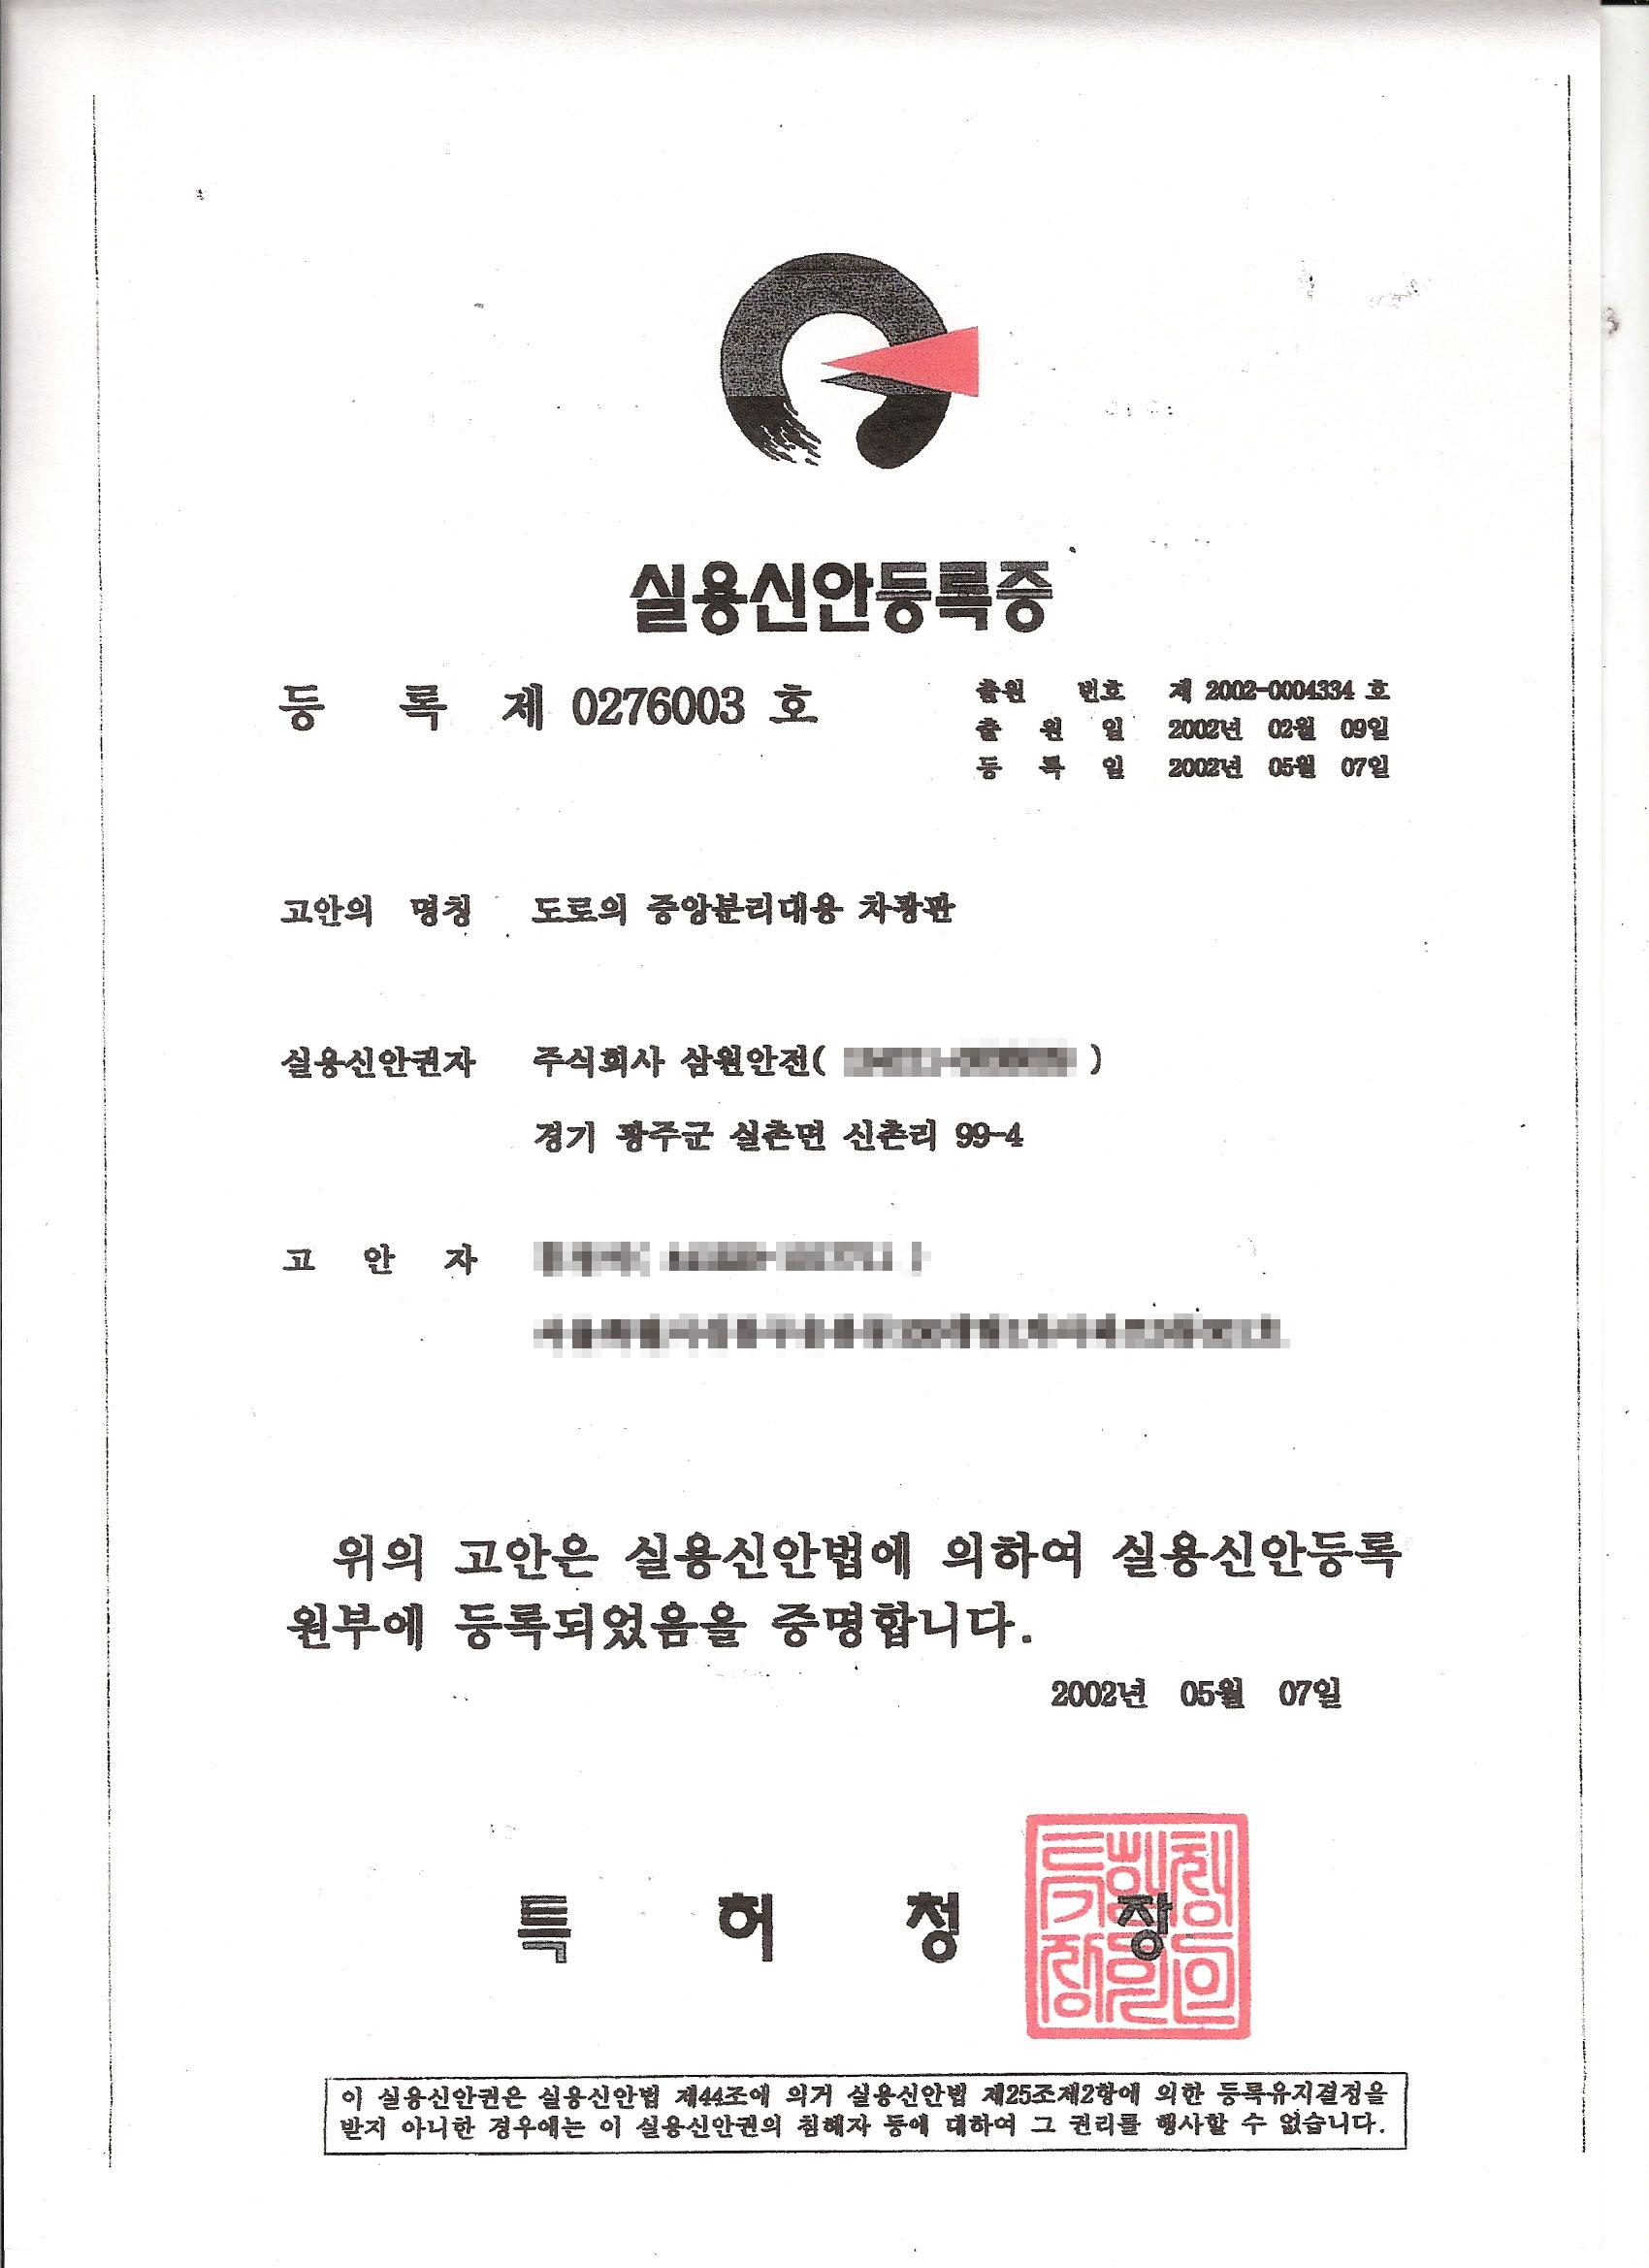 Certification samwon road safety coltd samwon road safety certificate of utility model registration 1betcityfo Image collections